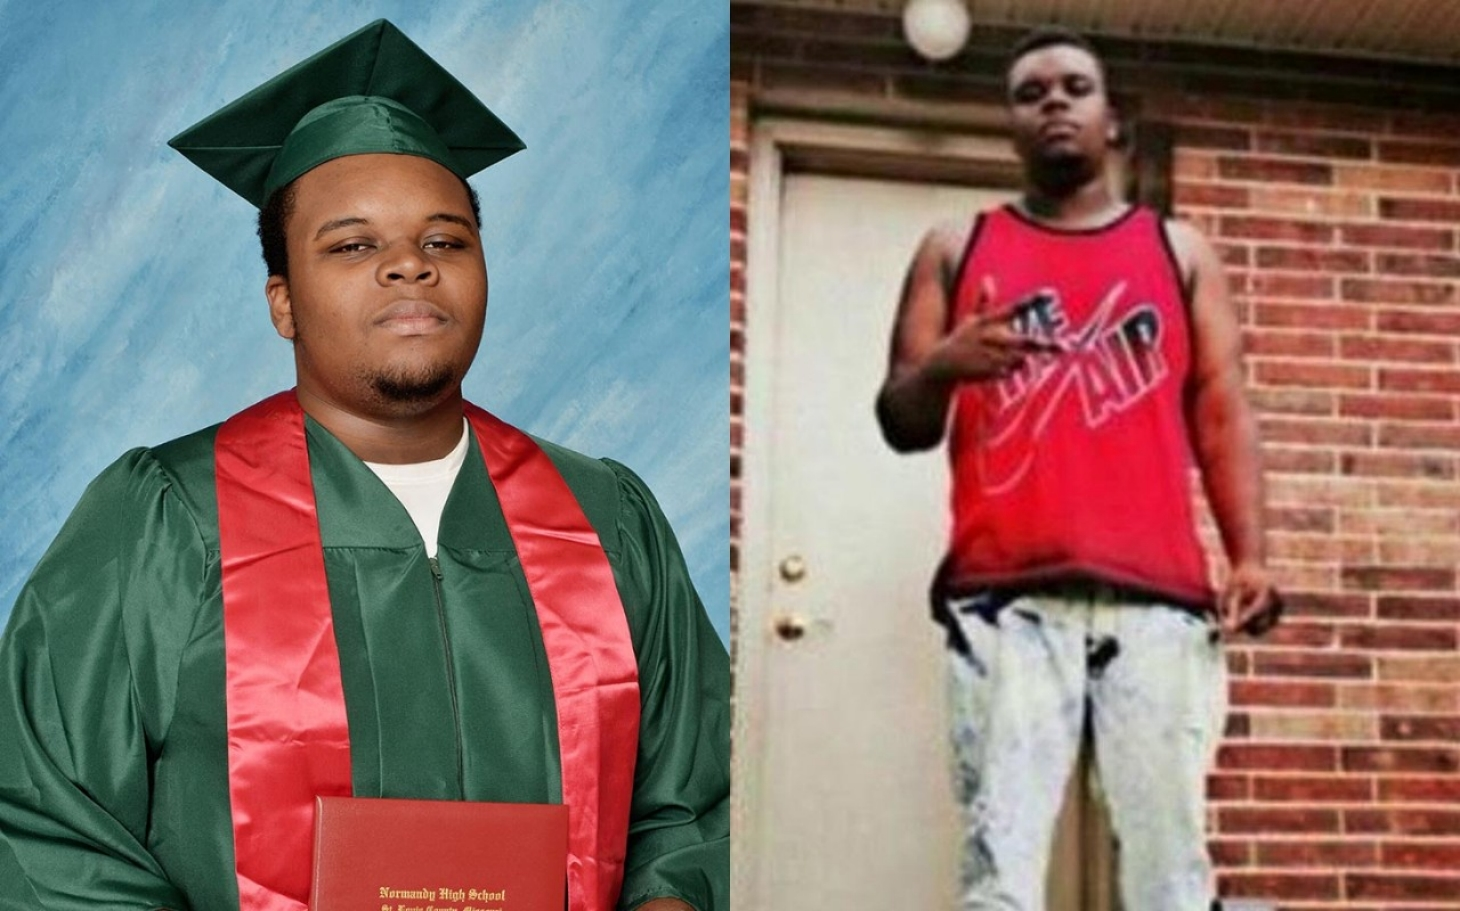 Black Students In Us Get Criminalized >> Ferguson Reports Raise Questions On Media Criminalization Of Blacks